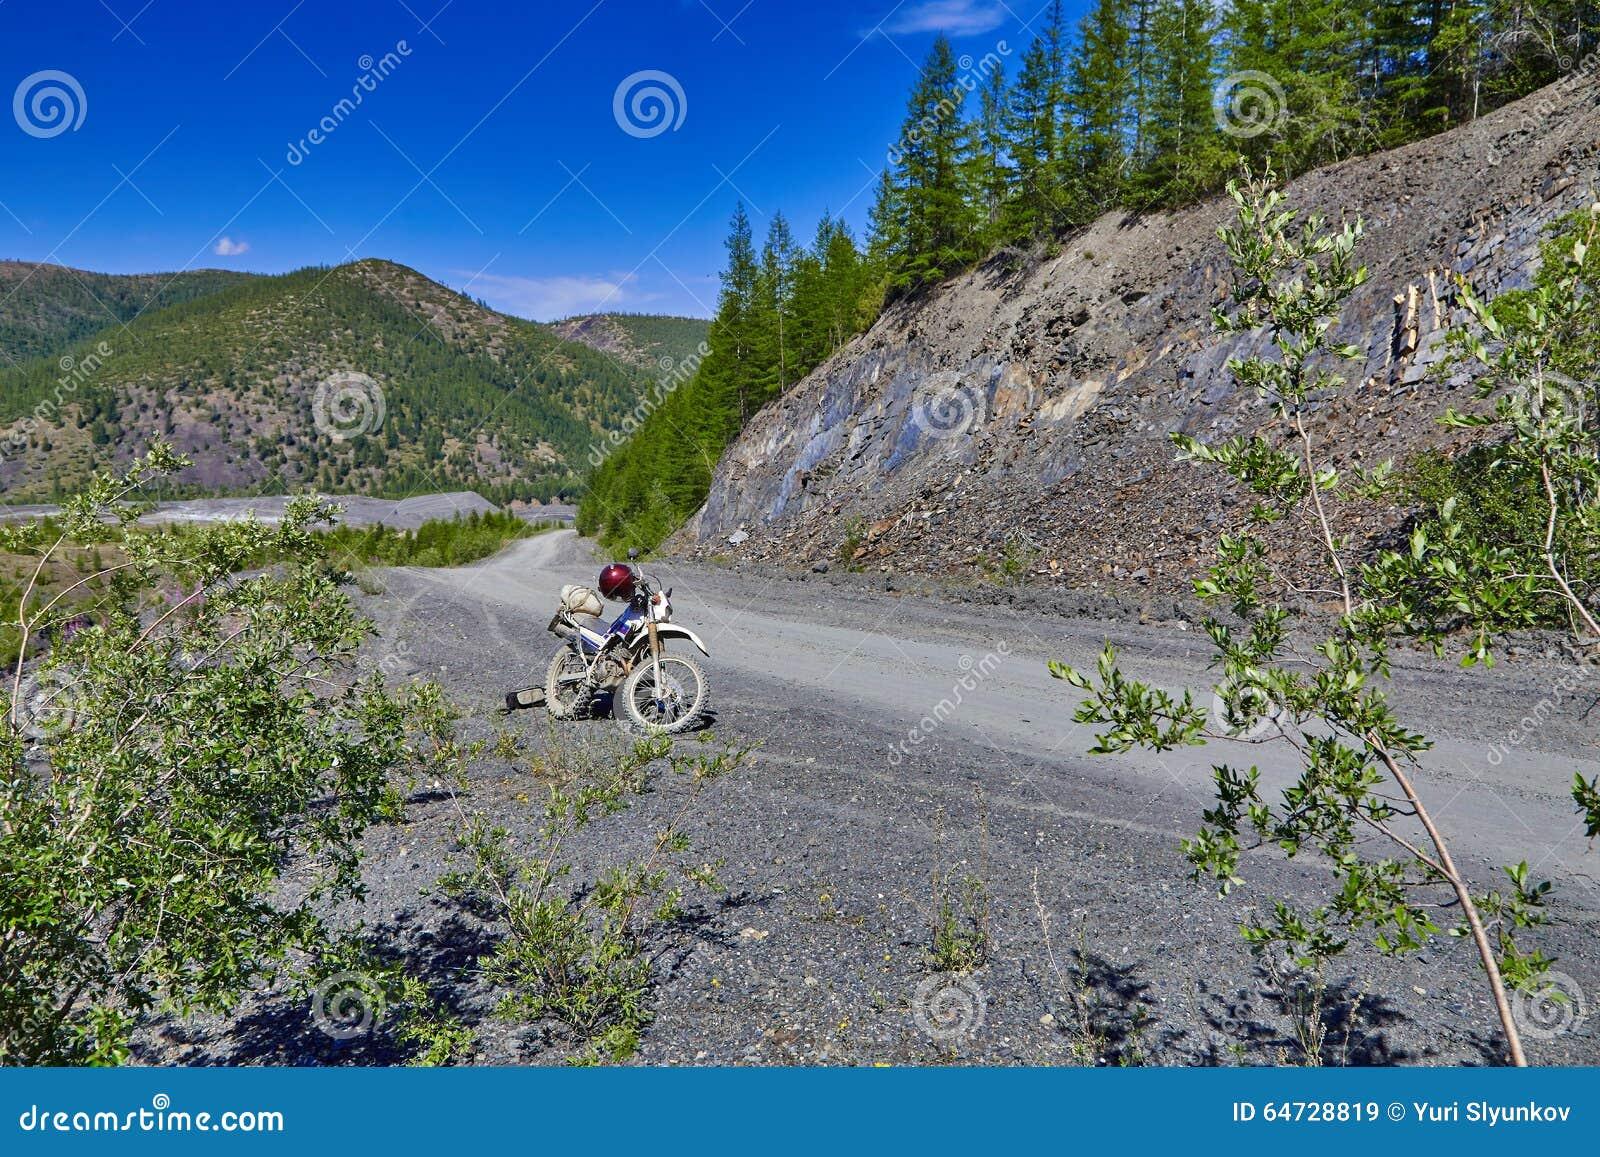 Mountain road. A motorcycle Enduro. Kolyma